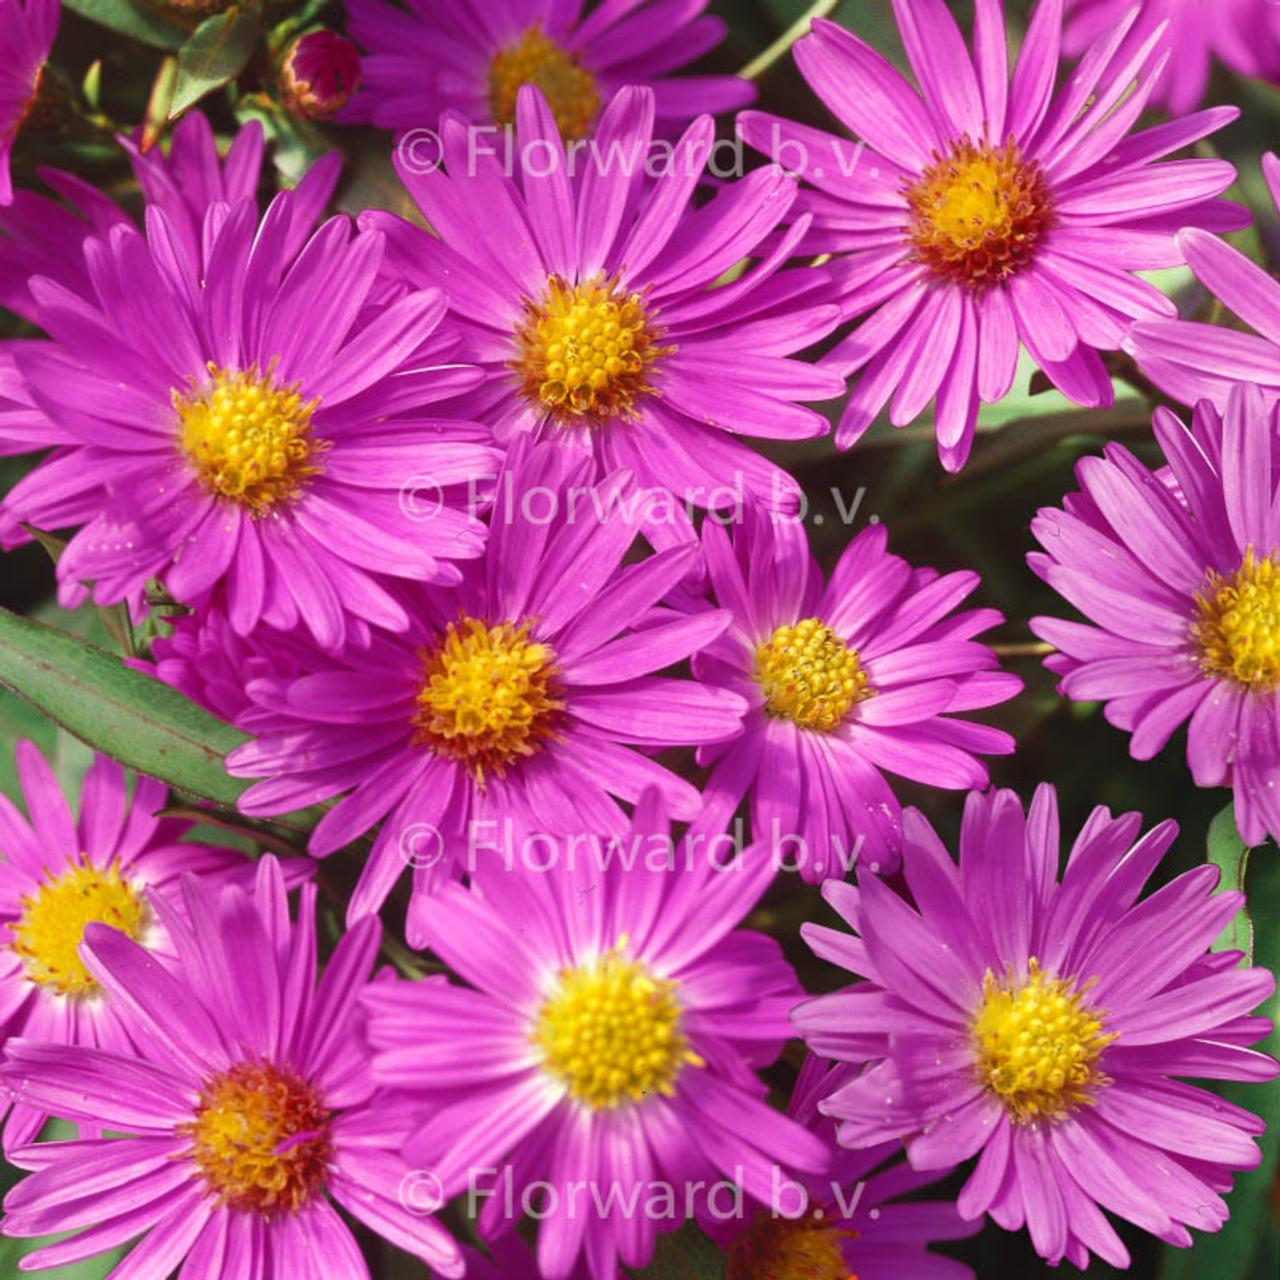 Aster dumosus 'Anneke' plant